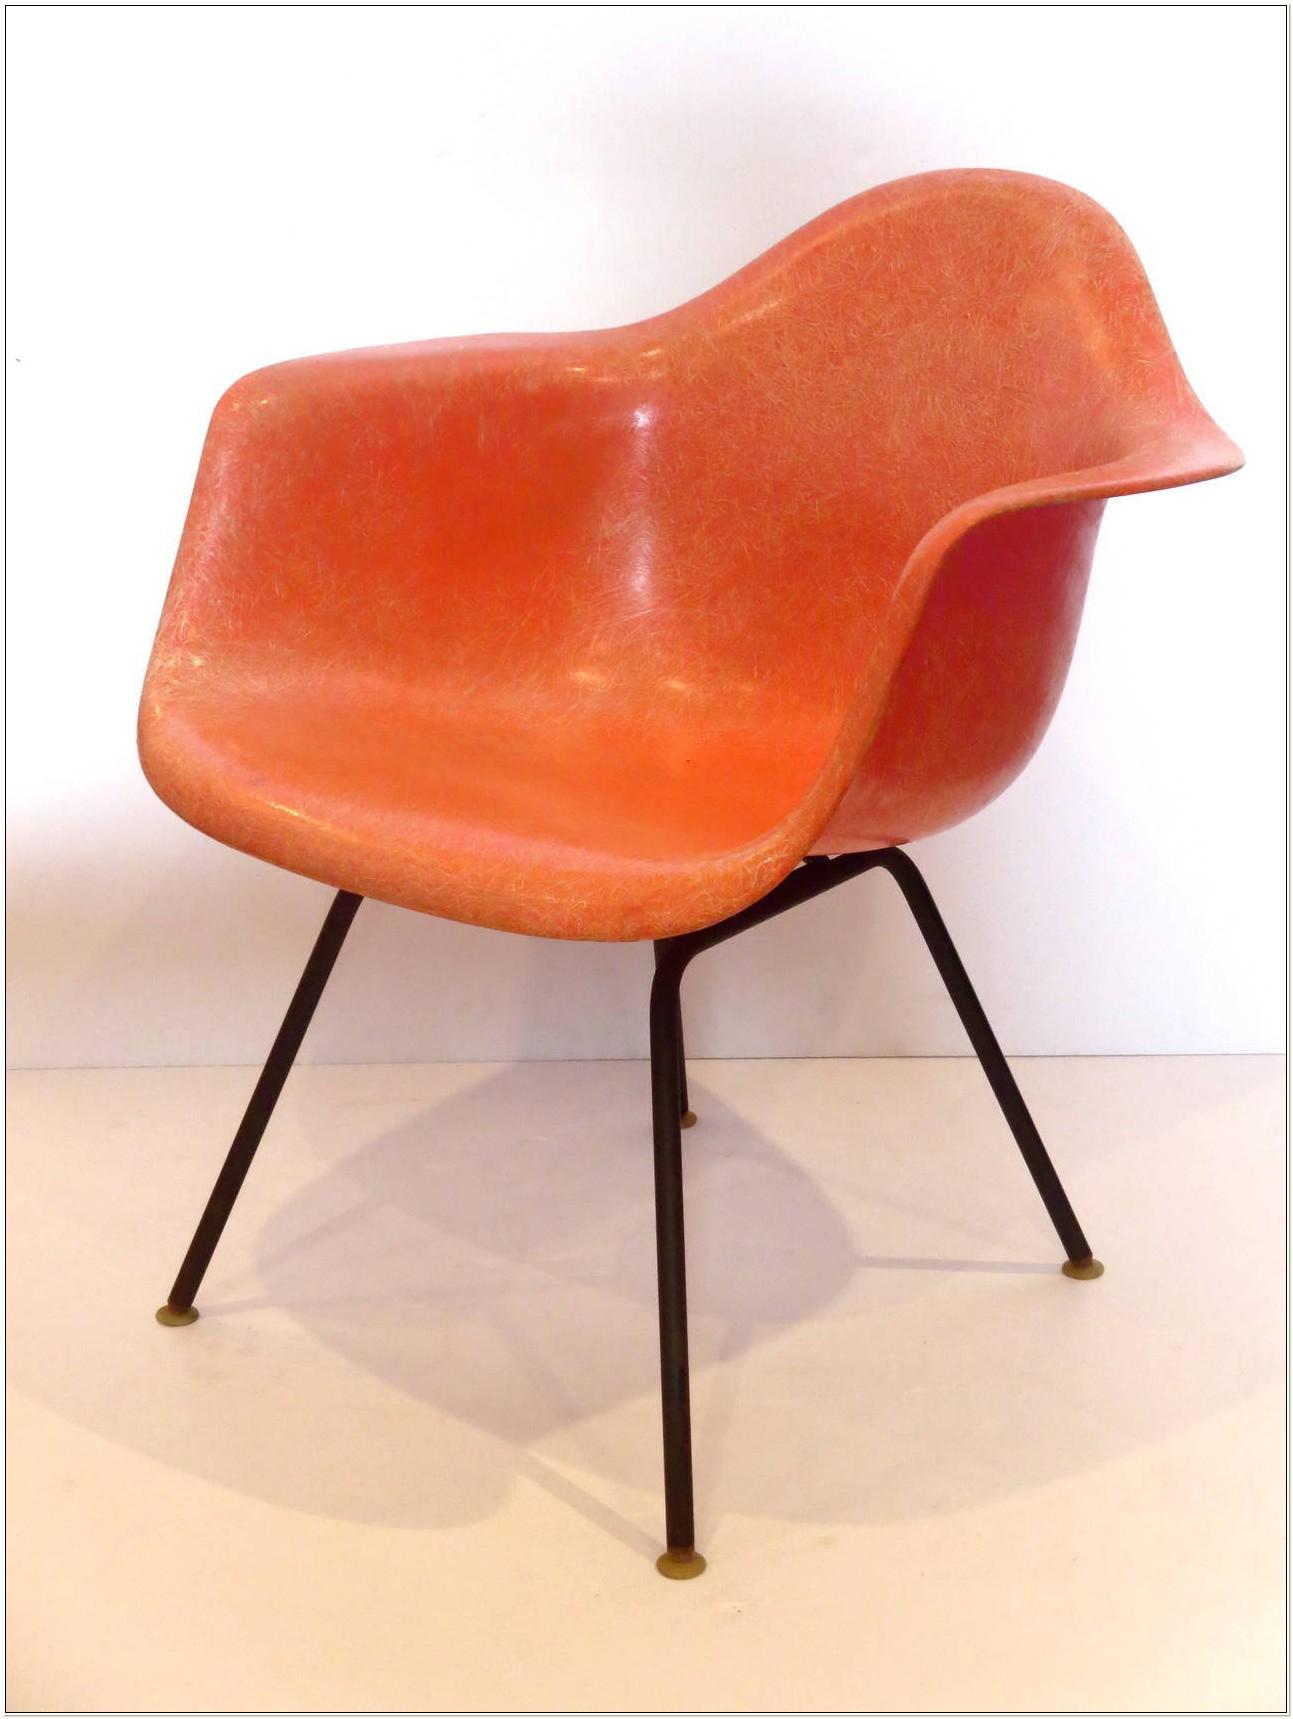 Eames Herman Miller Fiberglass Shell Side Chair